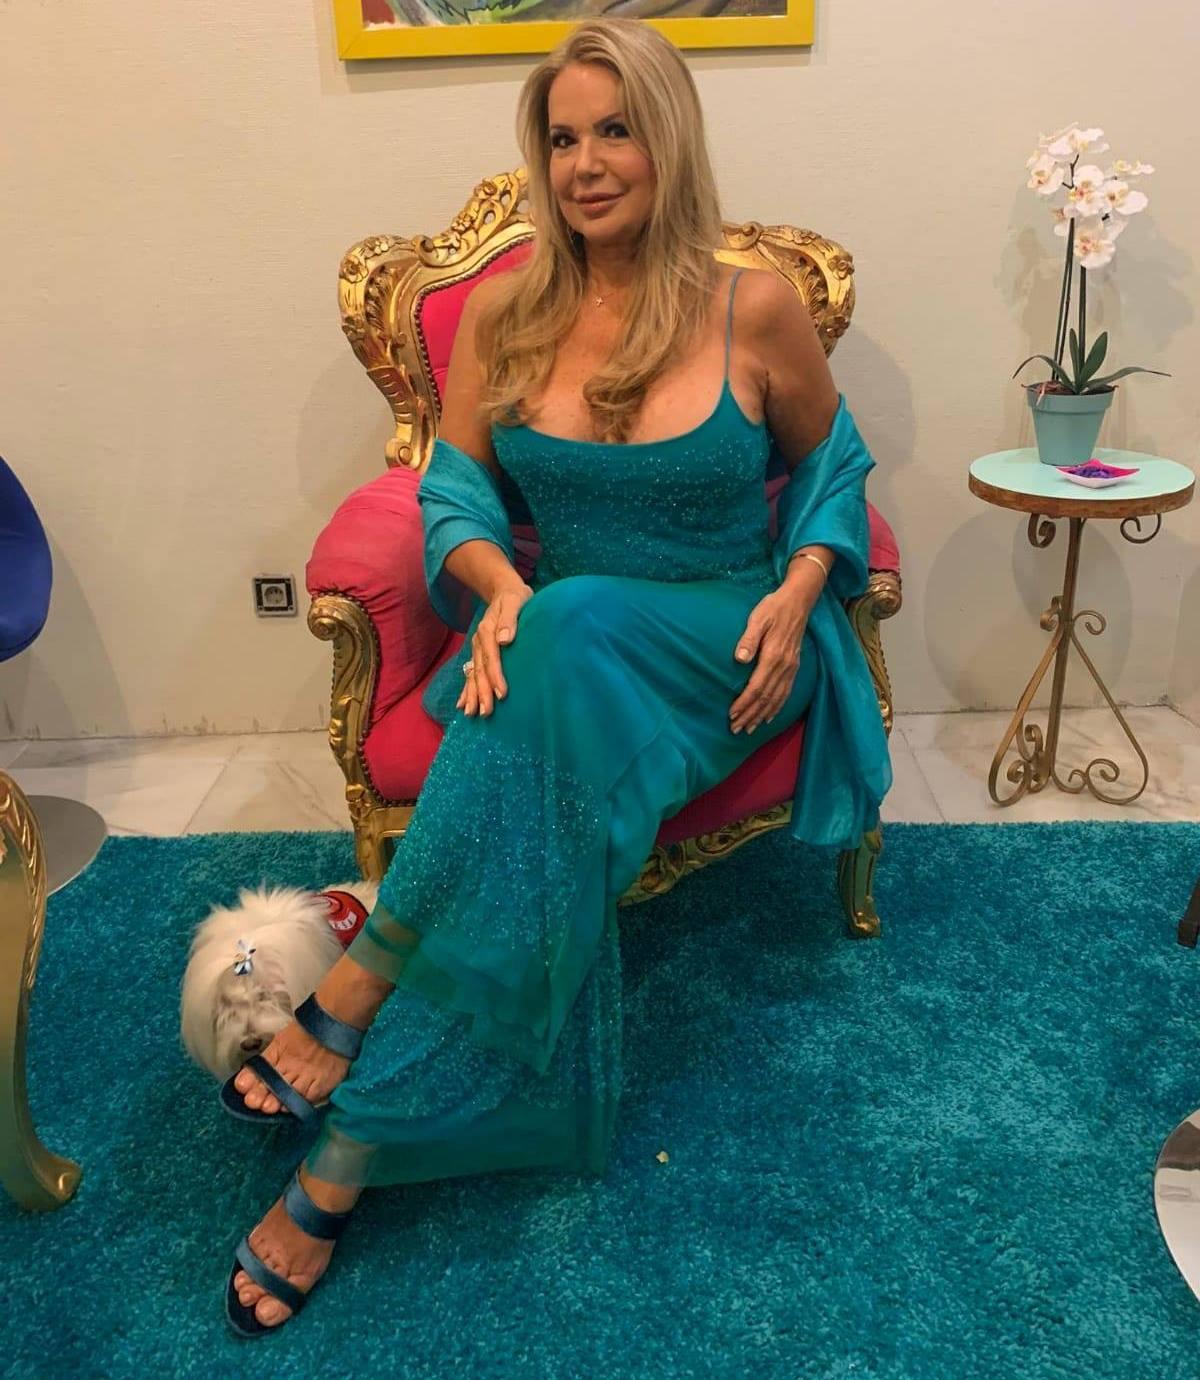 La diva delle telenovelas Jeannette Rodriguez rivela: Mi mancano i miei fan italiani